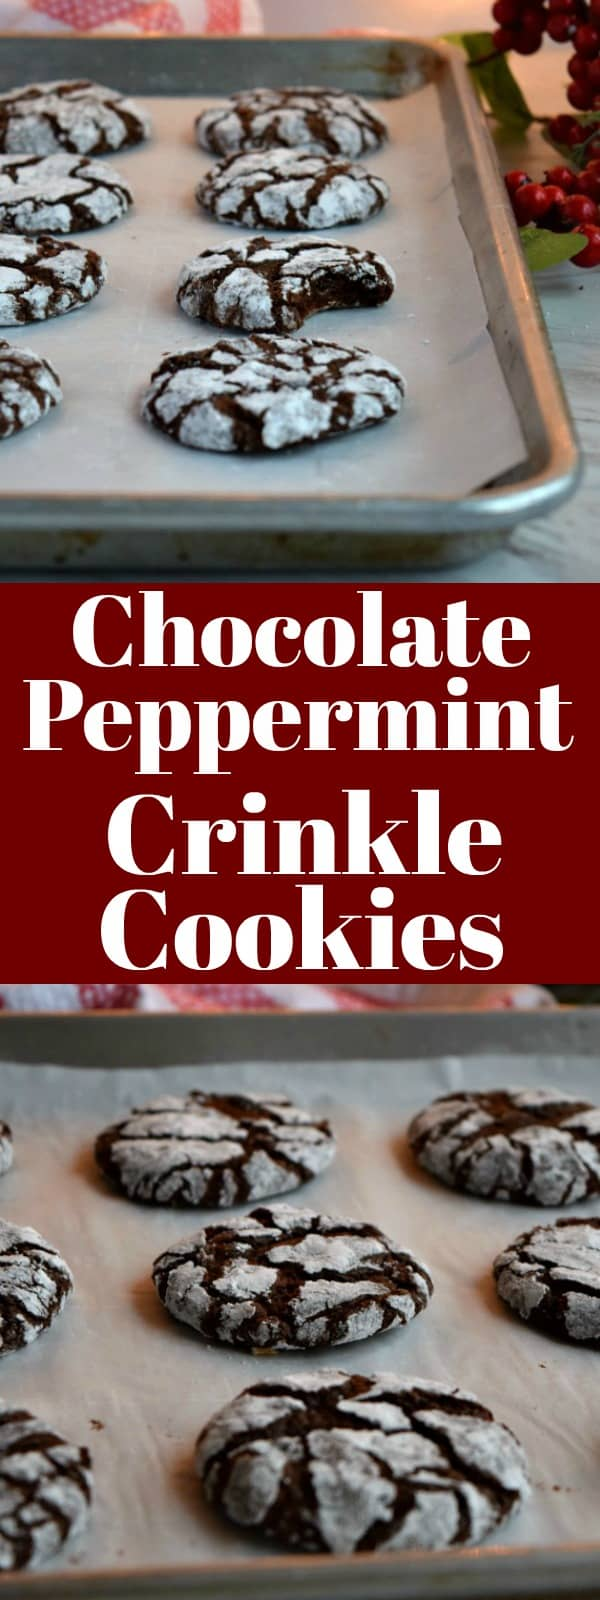 Chocolate Peppermint Crinkle Cookies Pinterest Pin #cookies #christmascookies #chocolate